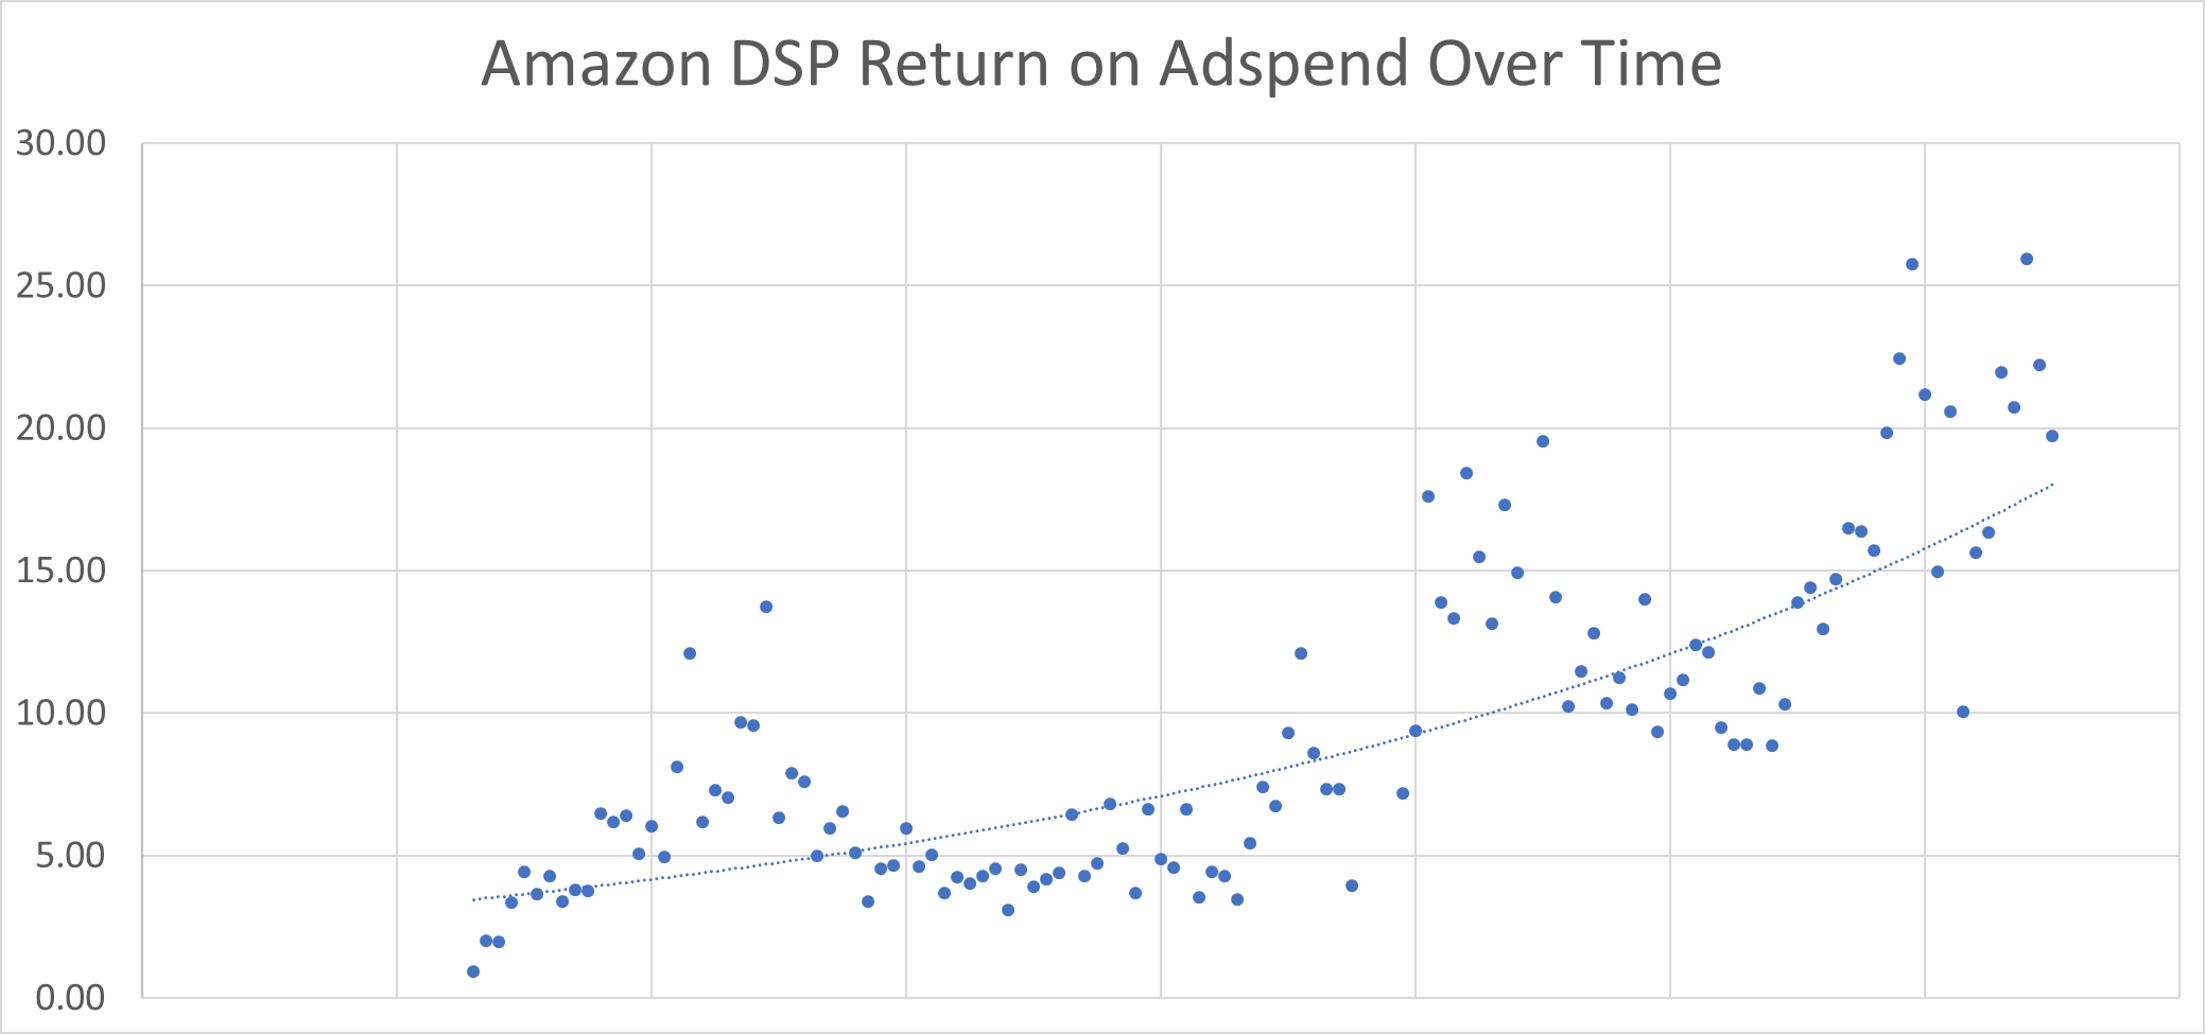 Amazon DSP Return on Adspend